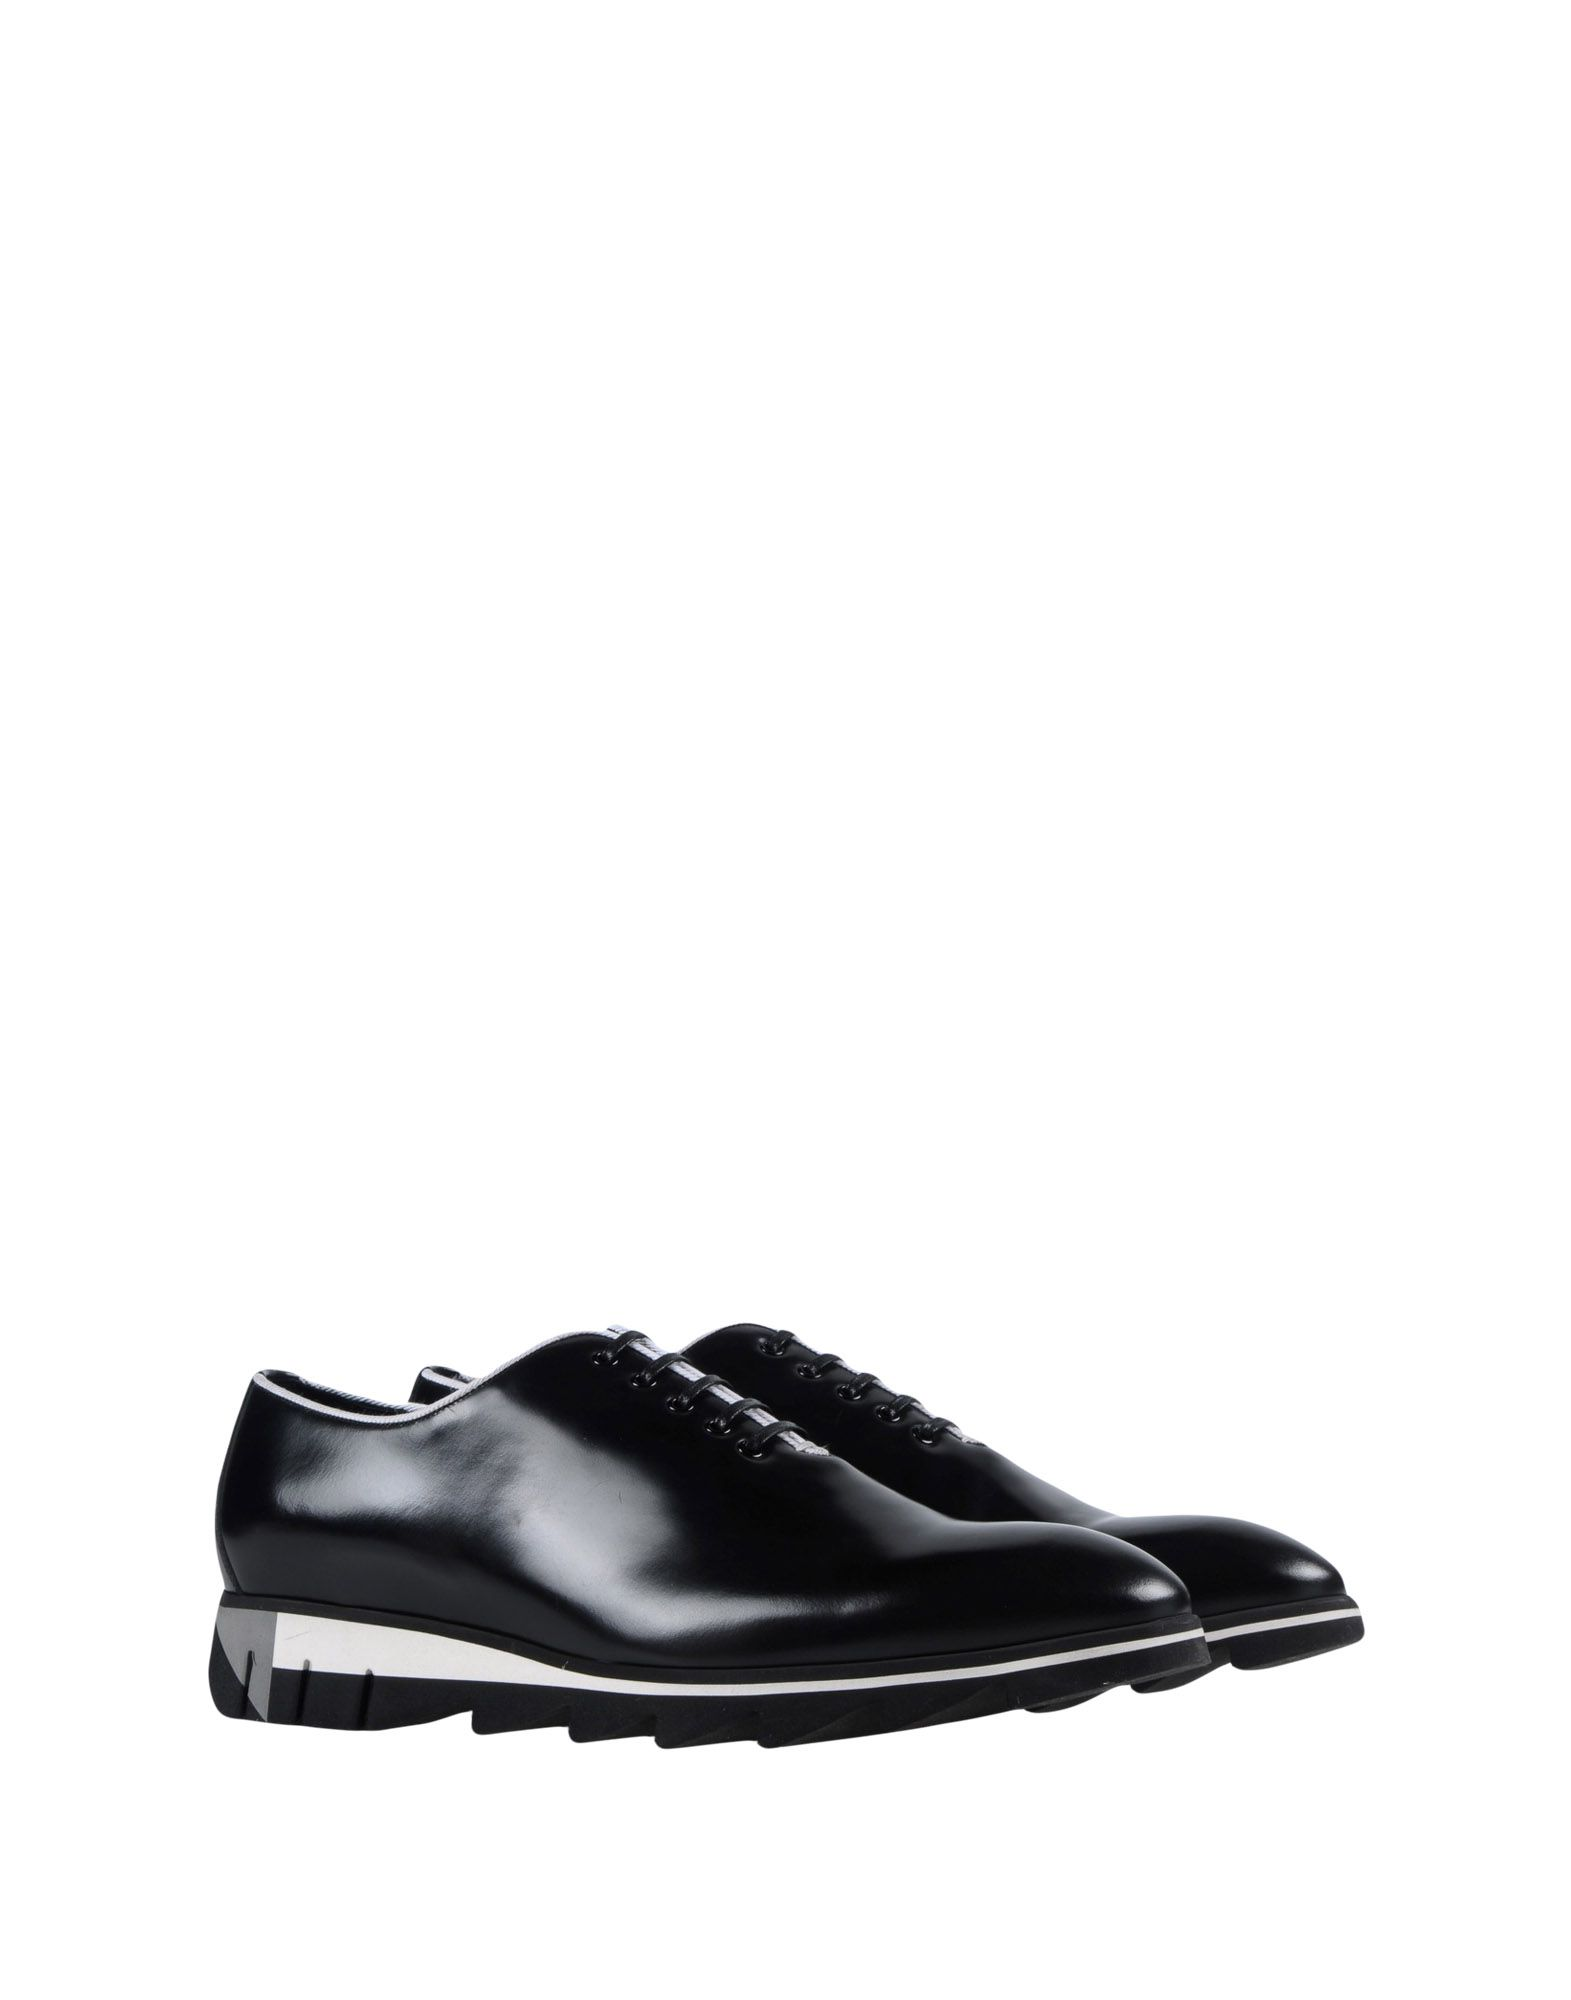 Dolce Schuhe & Gabbana Schnürschuhe Herren  11508172KB Neue Schuhe Dolce 6fe76b